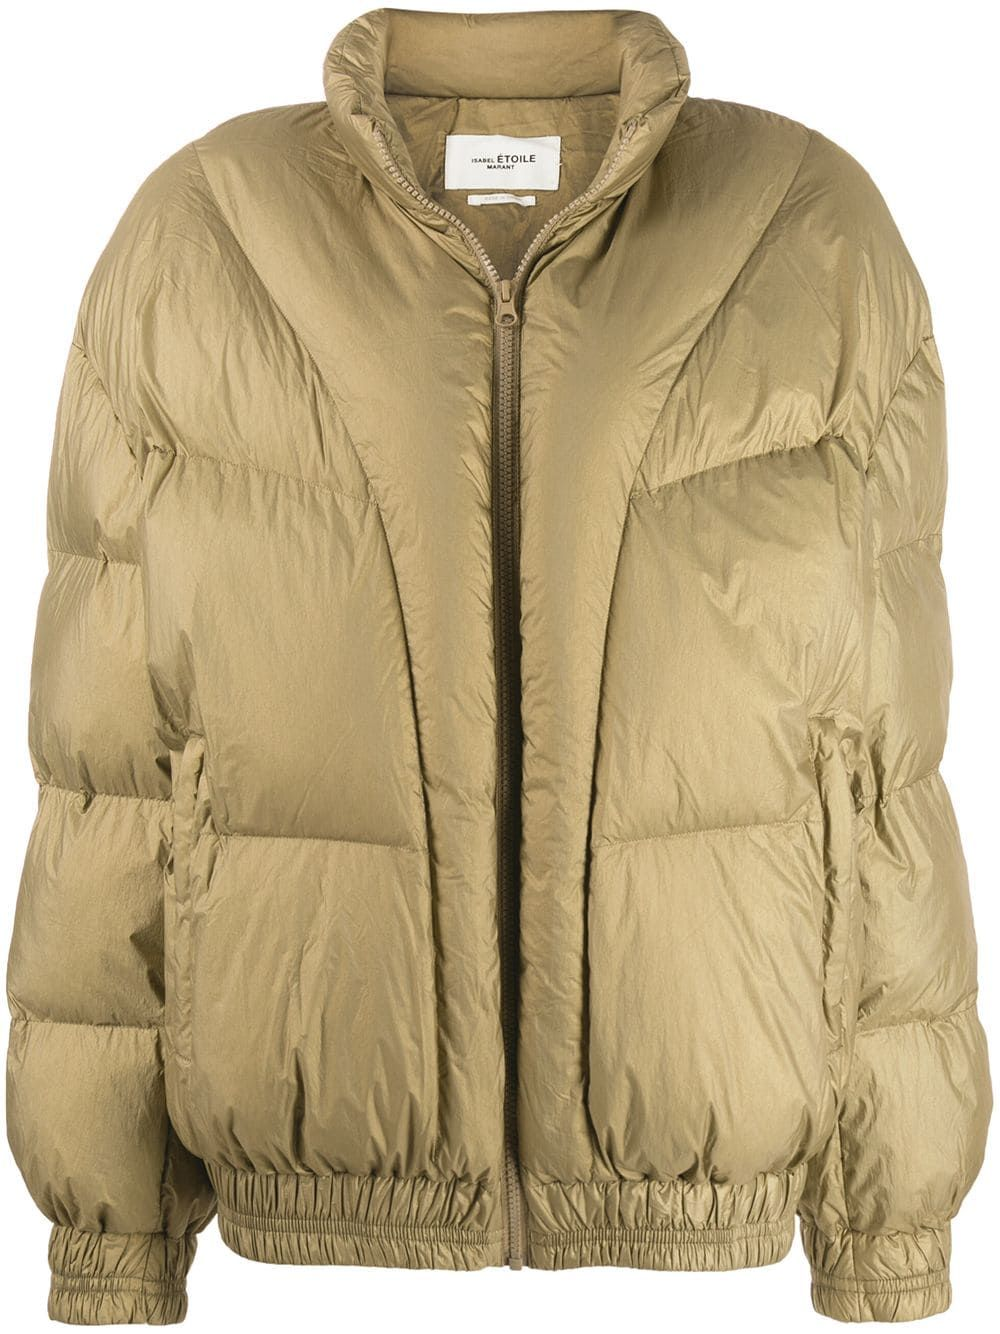 Isabel Marant Etoile Kristen Puffer Jacket Farfetch Puffer Jackets Isabel Marant Jackets [ 1334 x 1000 Pixel ]